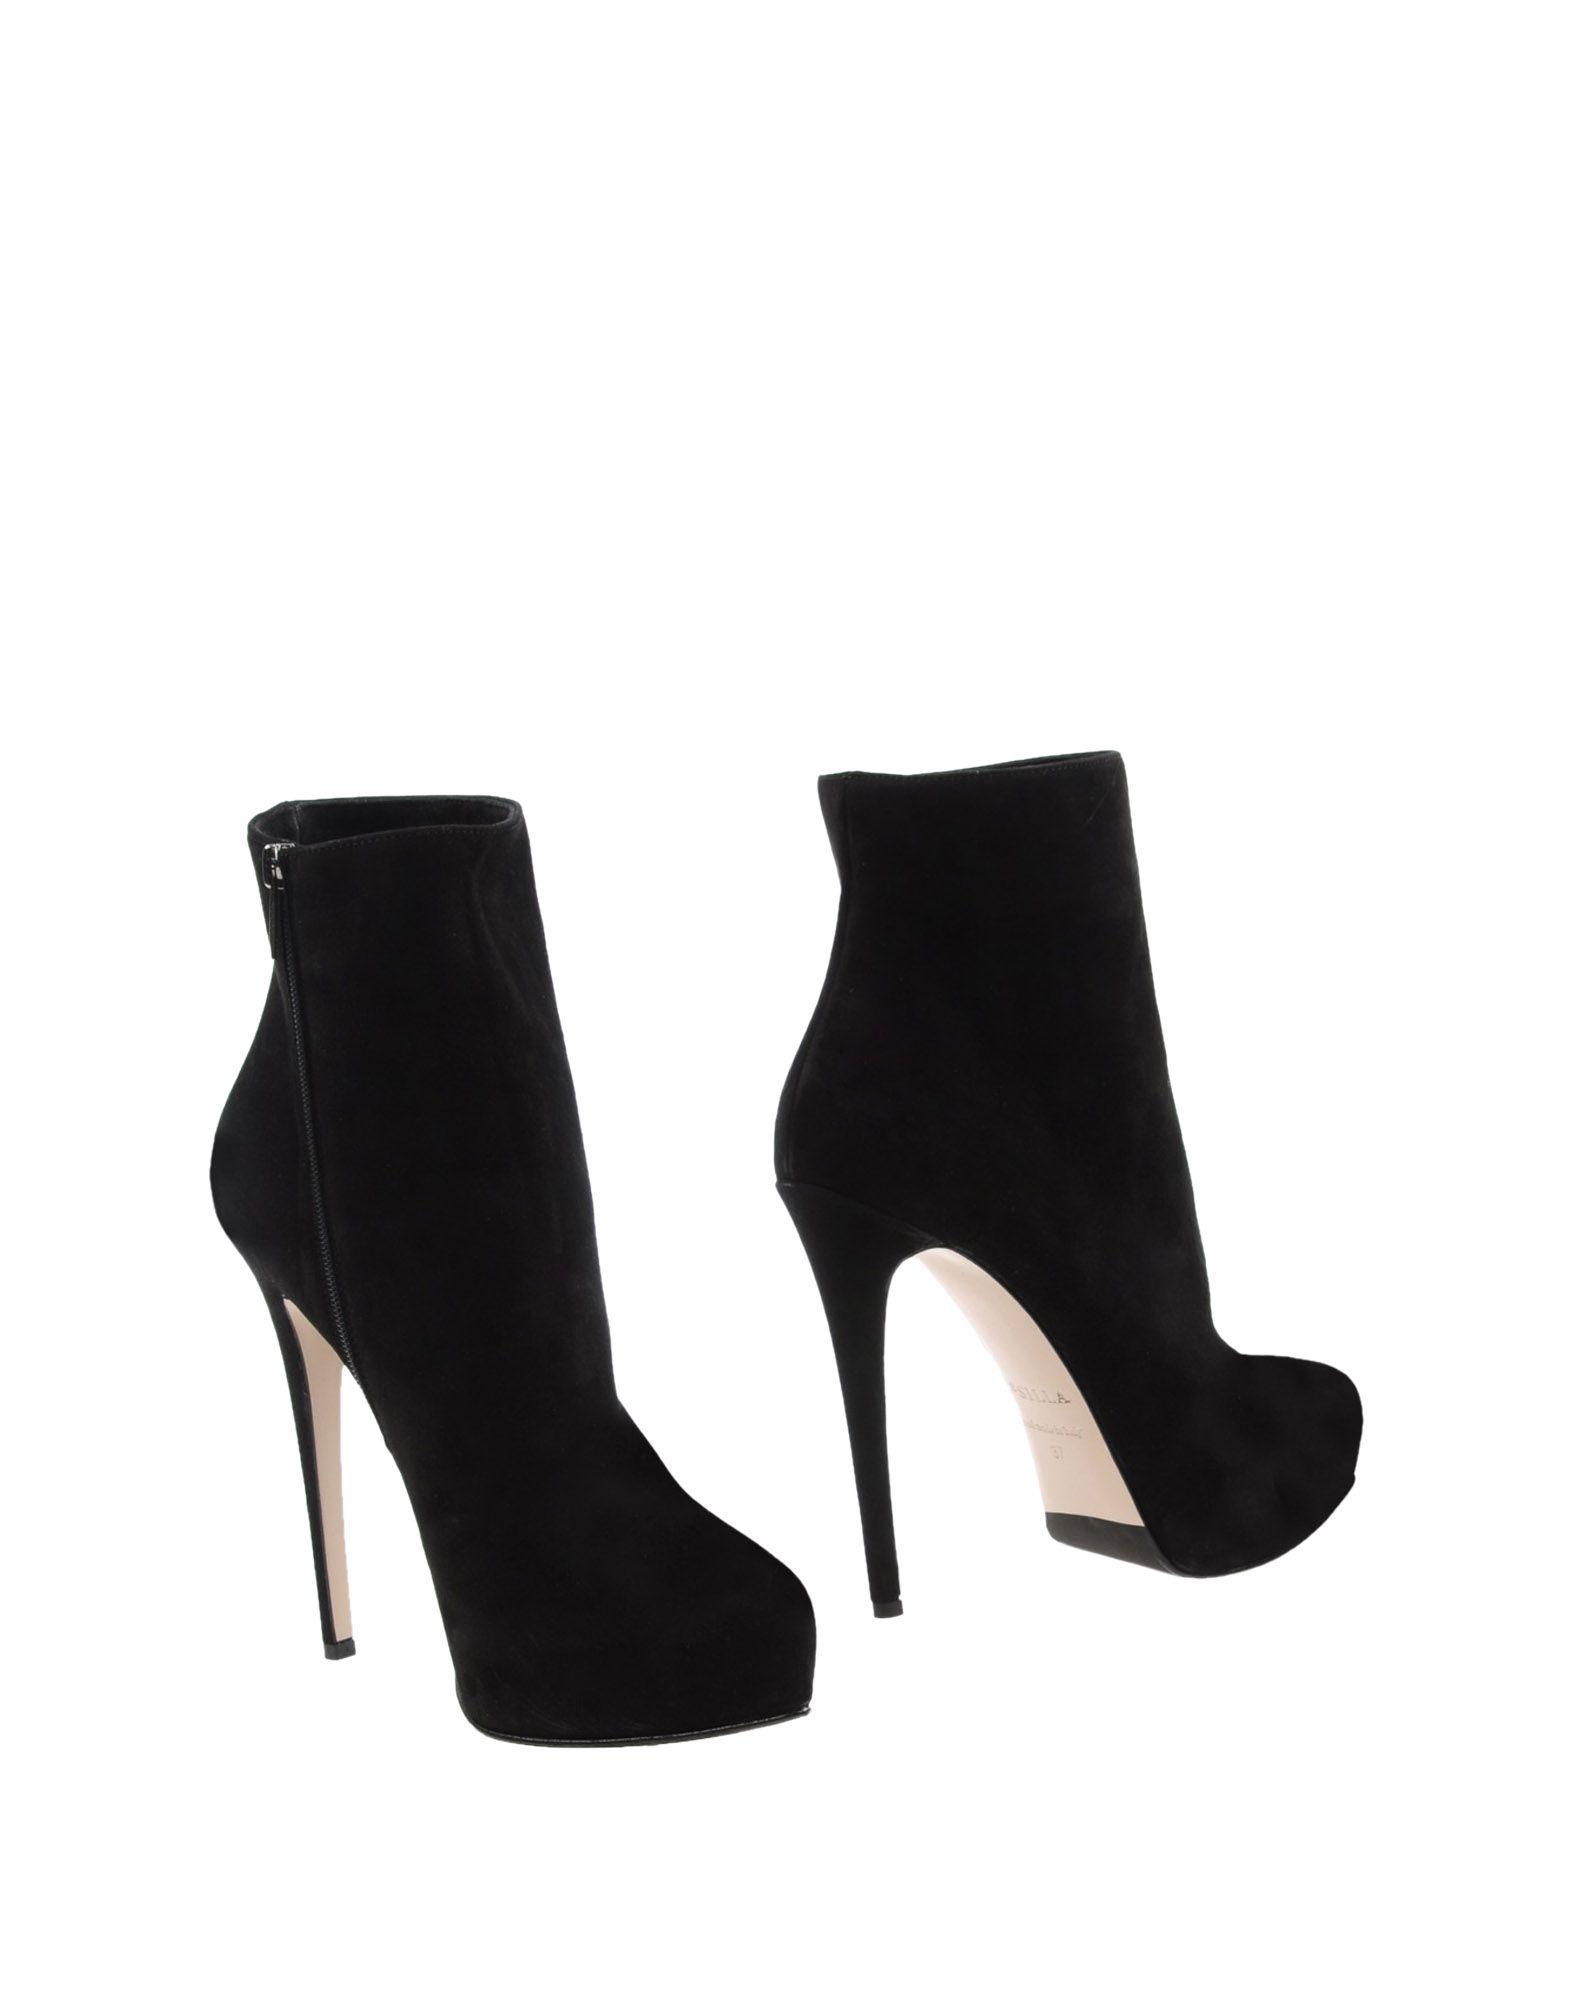 Le Silla Stiefelette Damen Schuhe  11301164EBGünstige gut aussehende Schuhe Damen 67e546